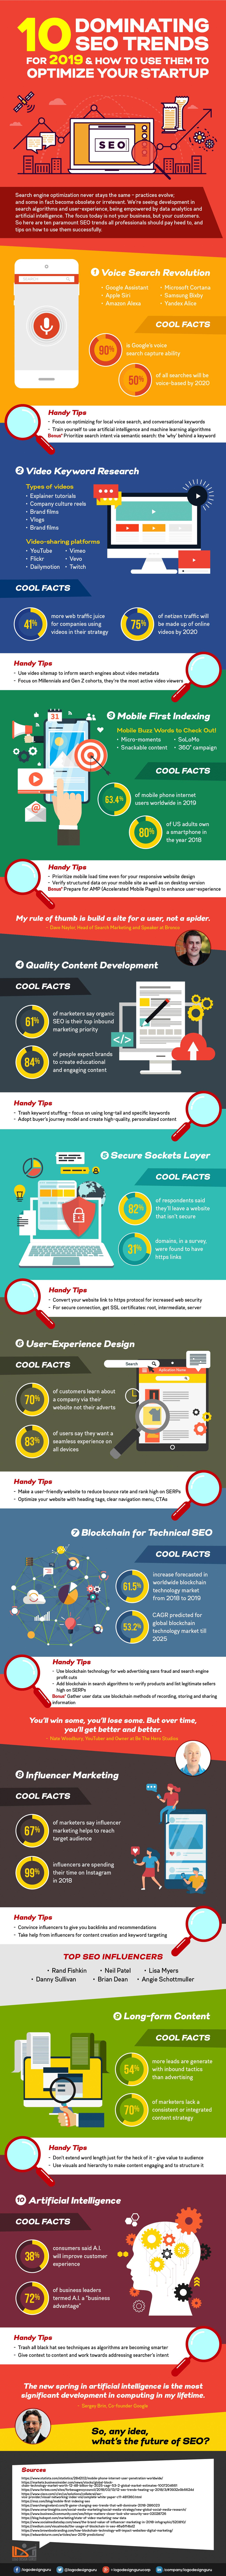 2019 SEO Trends Infographic